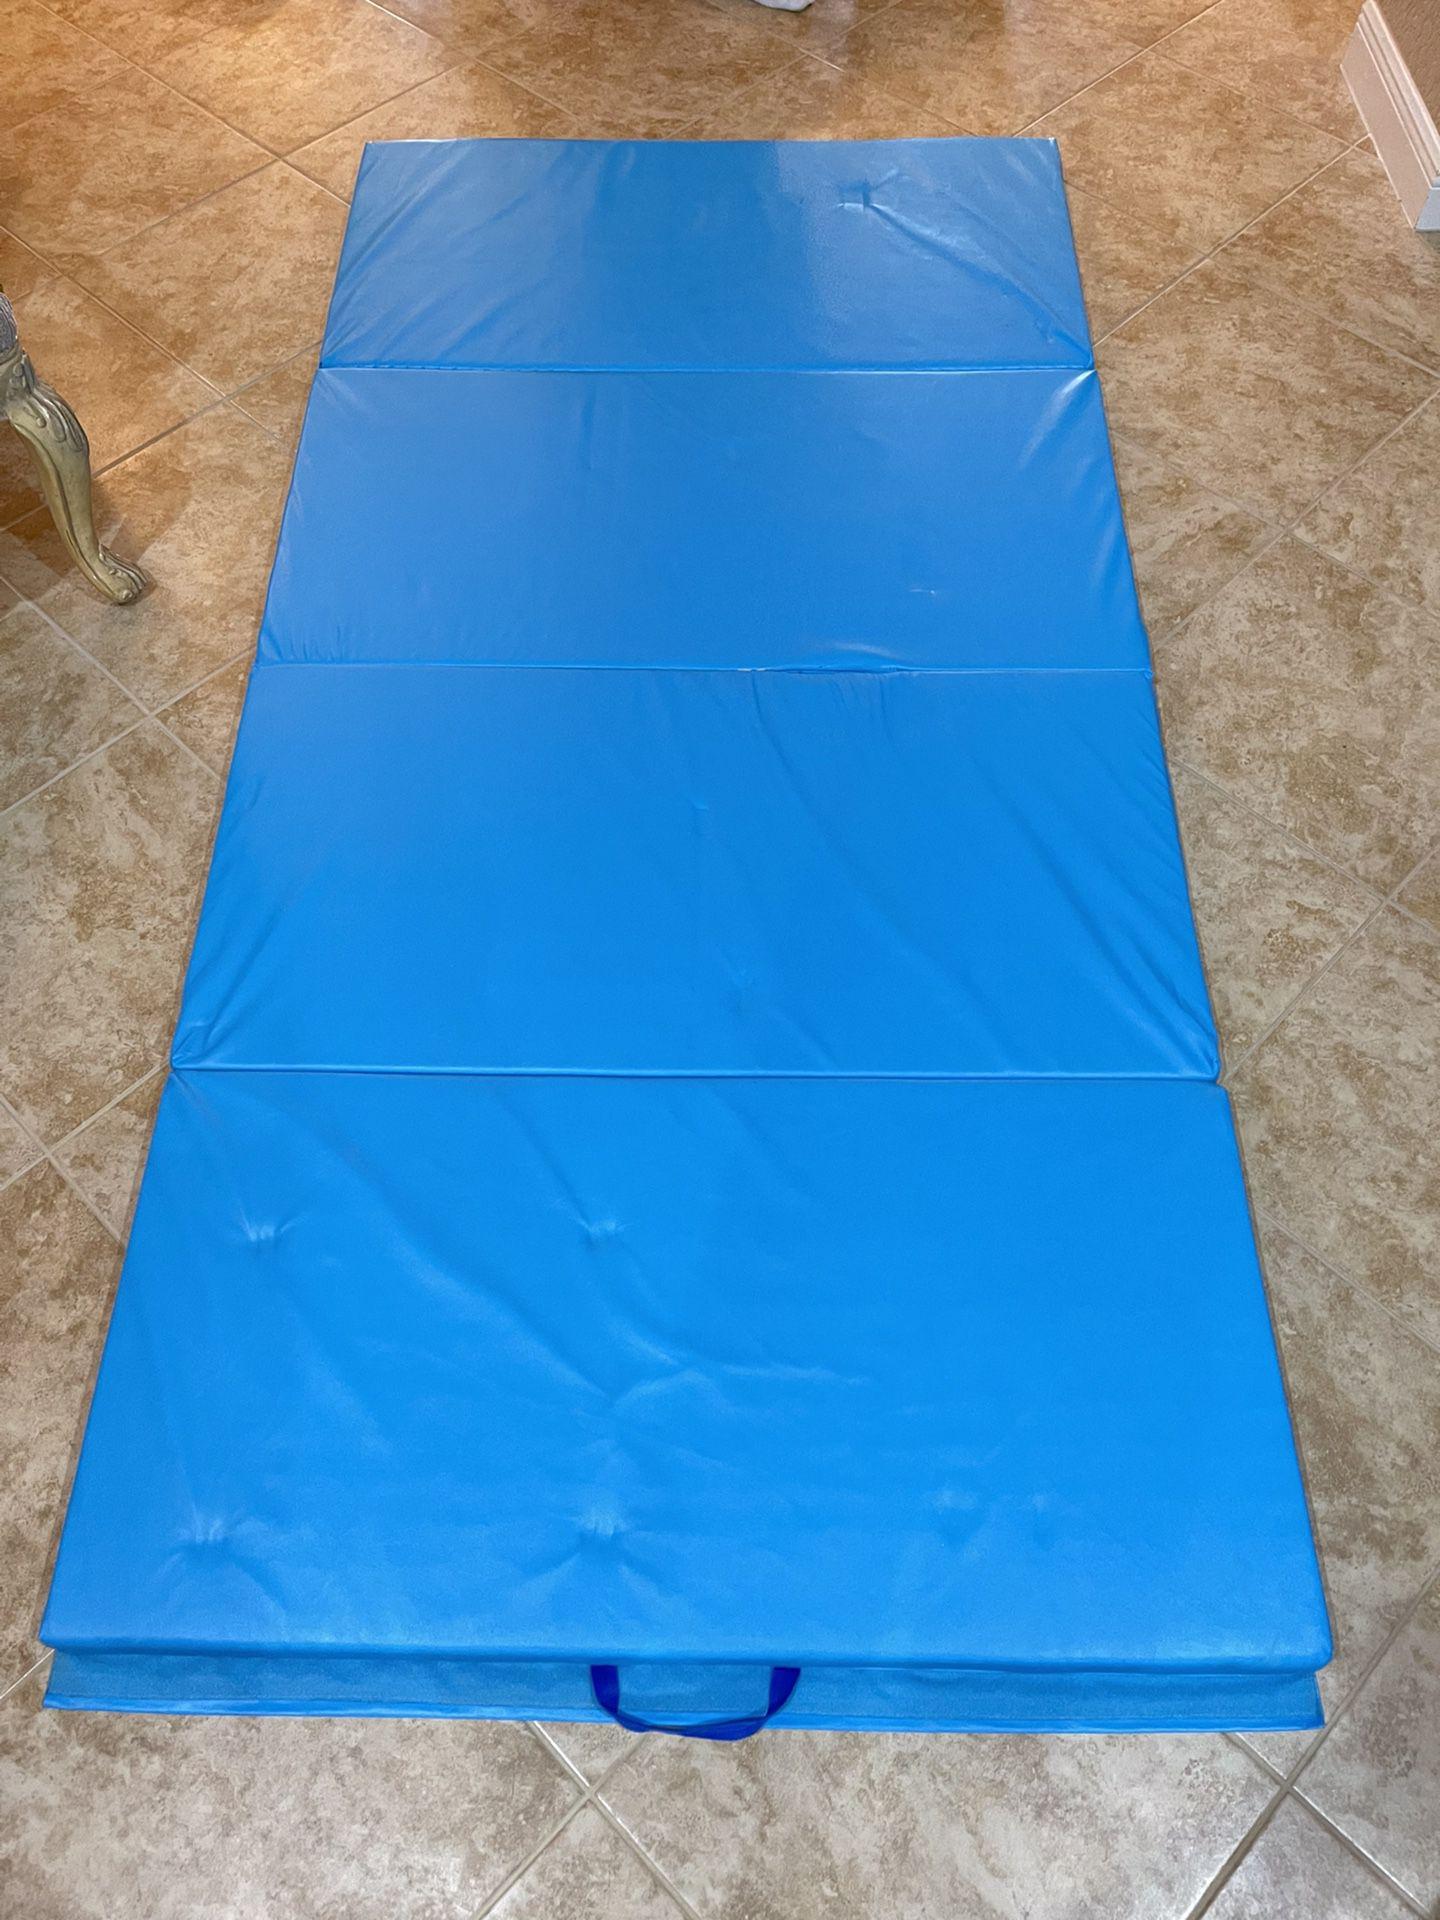 Tumbling Mat Exercise Gymnastics Sports